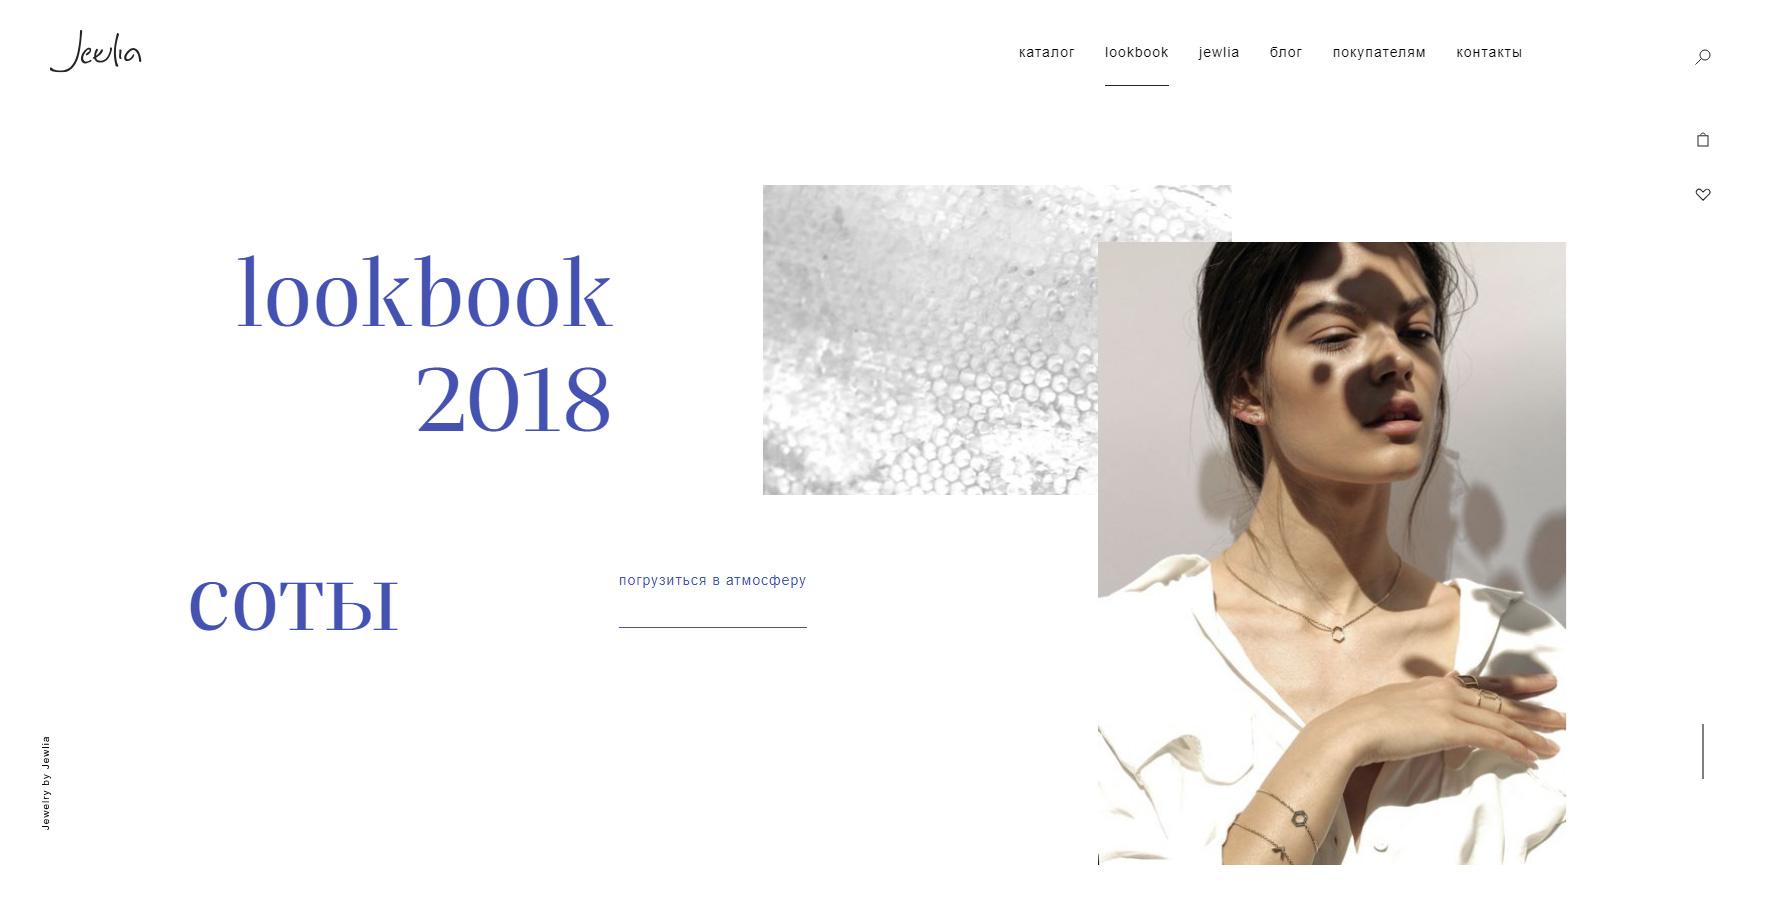 Jewlia - Website of the Day